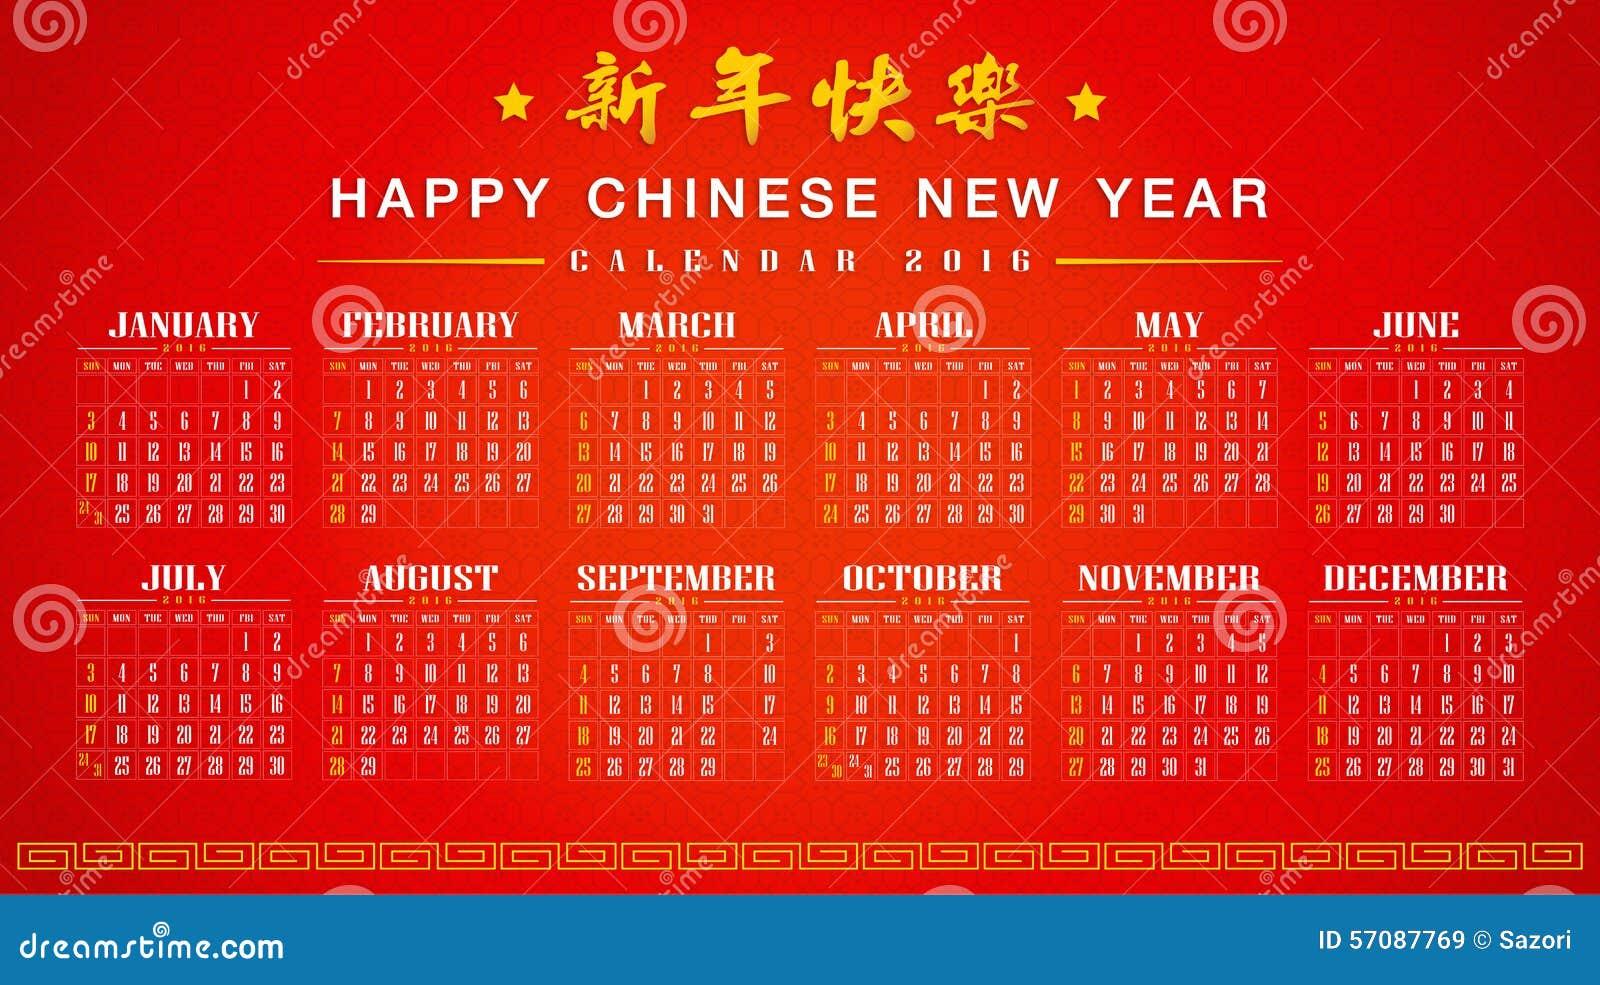 Calendar Chinese New Year : China chinese calendar stock illustration image